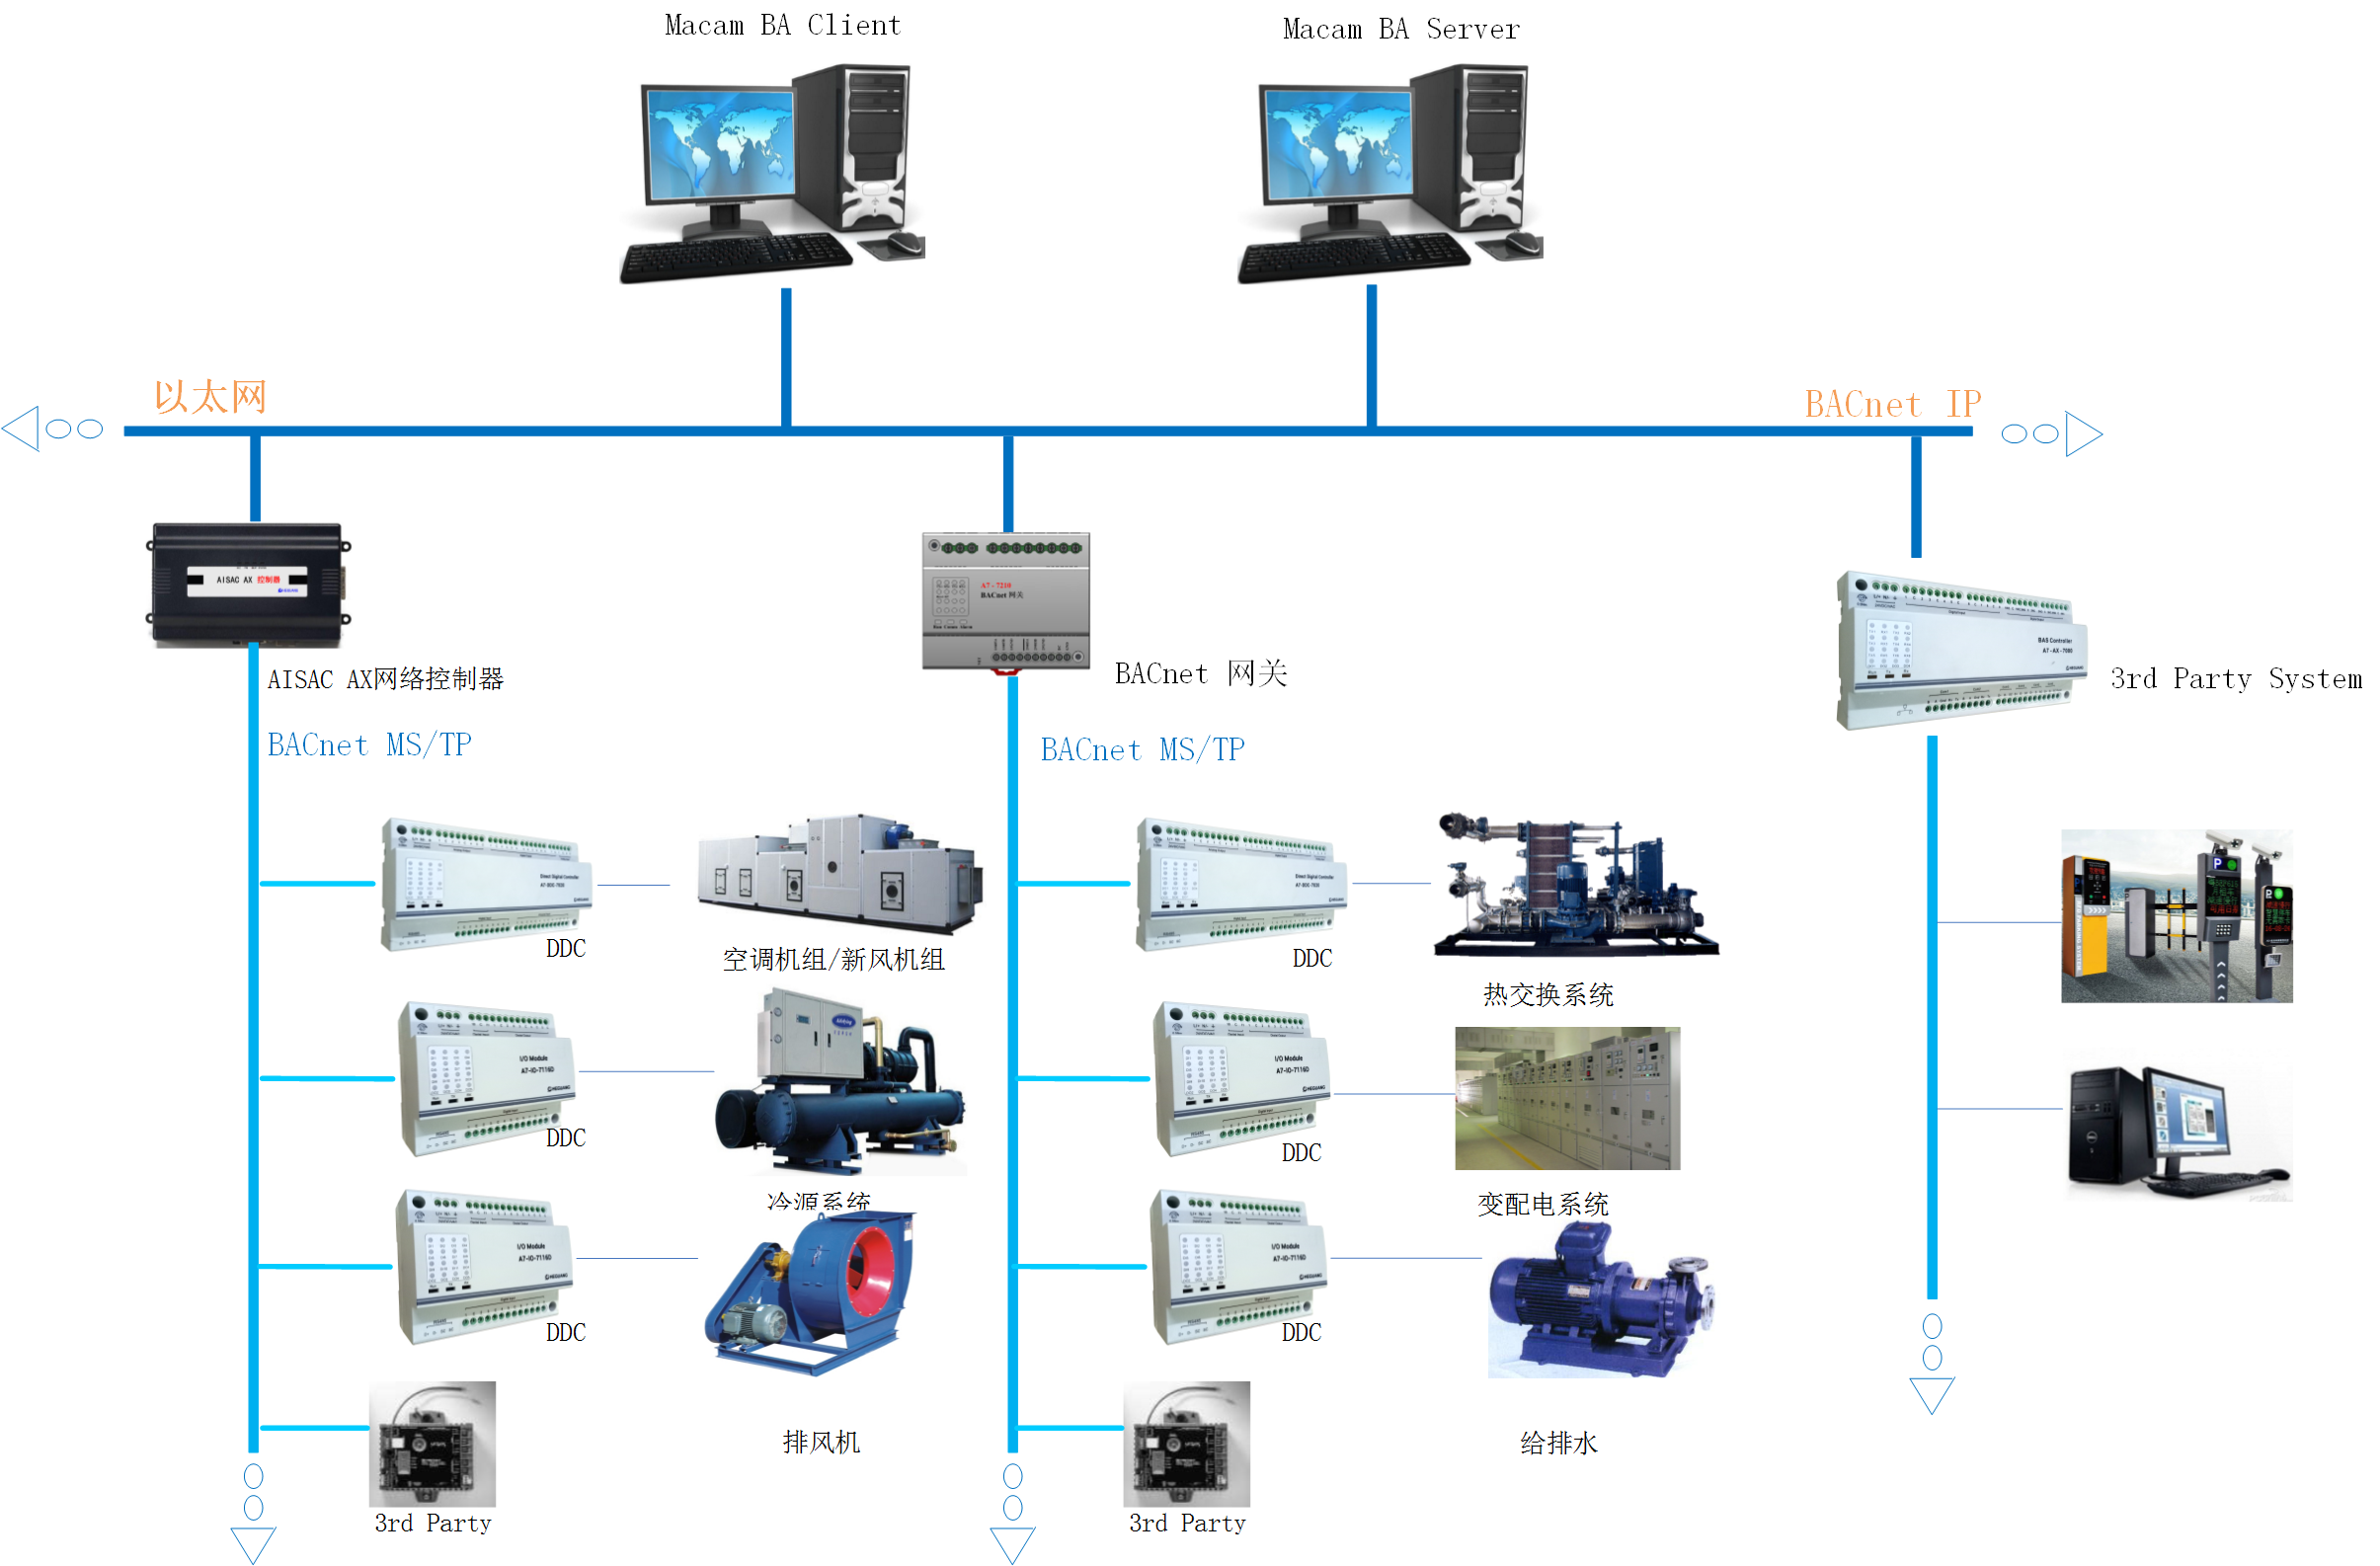 AISAC-7000楼宇自动控制系统是深圳市合广测控技术有限公司自主研发的、基于先进、开放、互联网的自动化基础架构解决方案,帮助您的系统达到高度的灵活性。AISAC-7000楼宇自动控制系统解决方案能够将设施内重要的建筑系统,如暖通空调(HVAC)、照明、变配电、给排水等系统,集成到一个统一的系统解决方案中,从而帮助设施管理人员、建筑业主、以及系统集成商实现设备管理系统自动化,起到改善系统运行品质、提高管理水平、降低运行管理劳动强度、节省运行能耗的作用。 AISAC-7000系统性能: 1)采用集散式控制